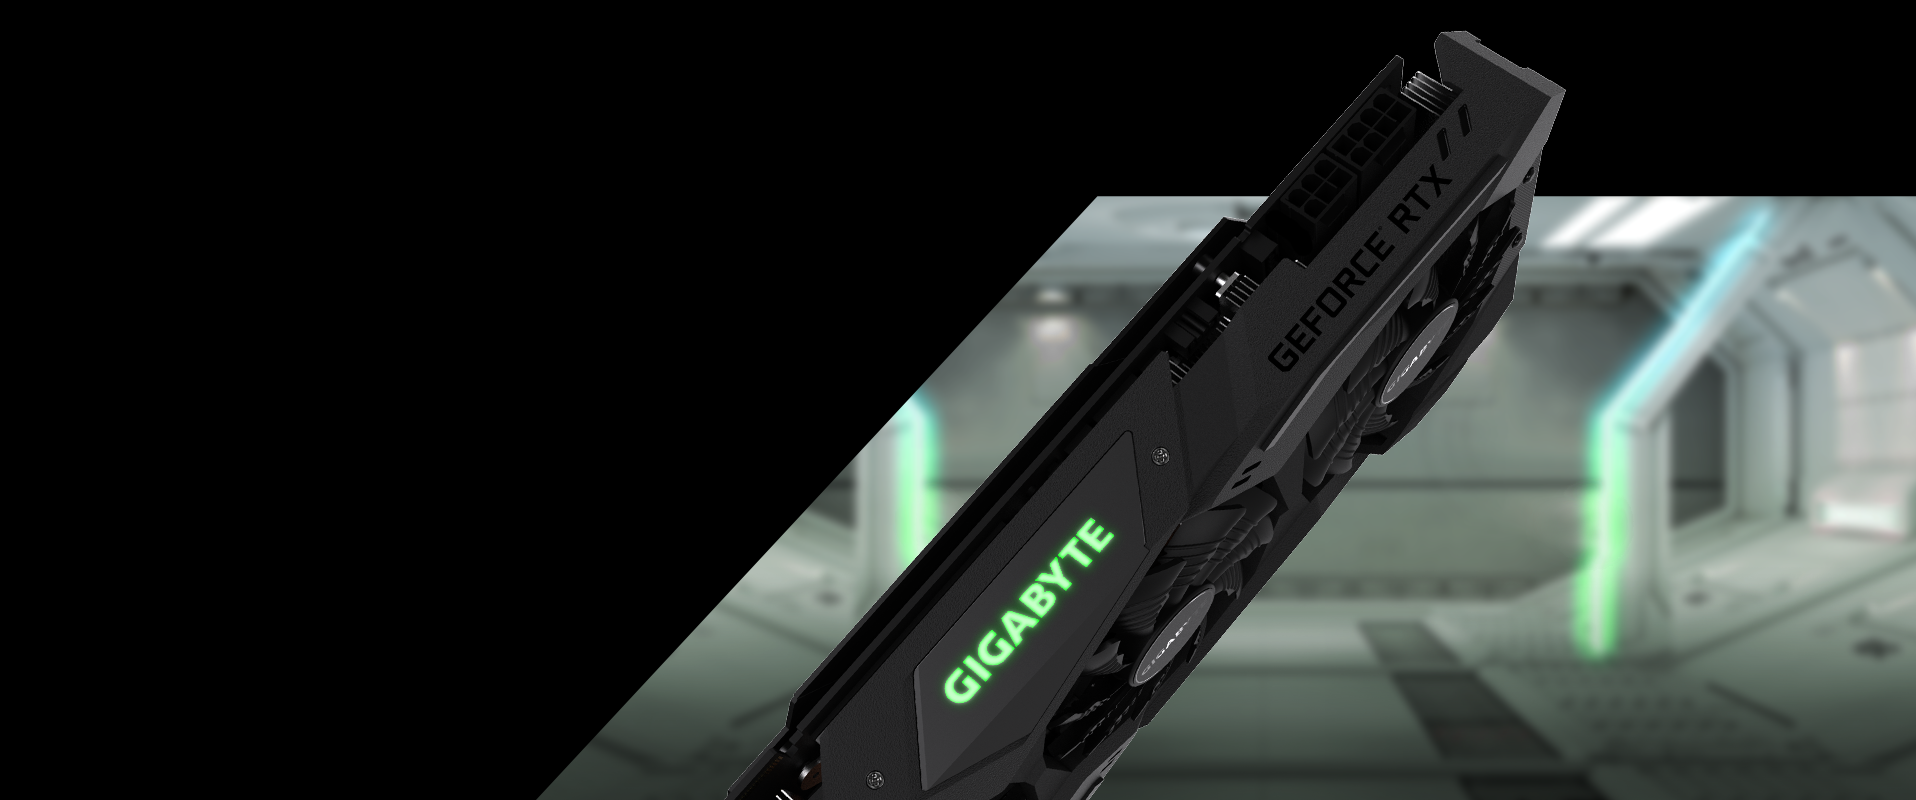 GeForce RTX™ 2070 WINDFORCE 8G   Graphics Card - GIGABYTE Global